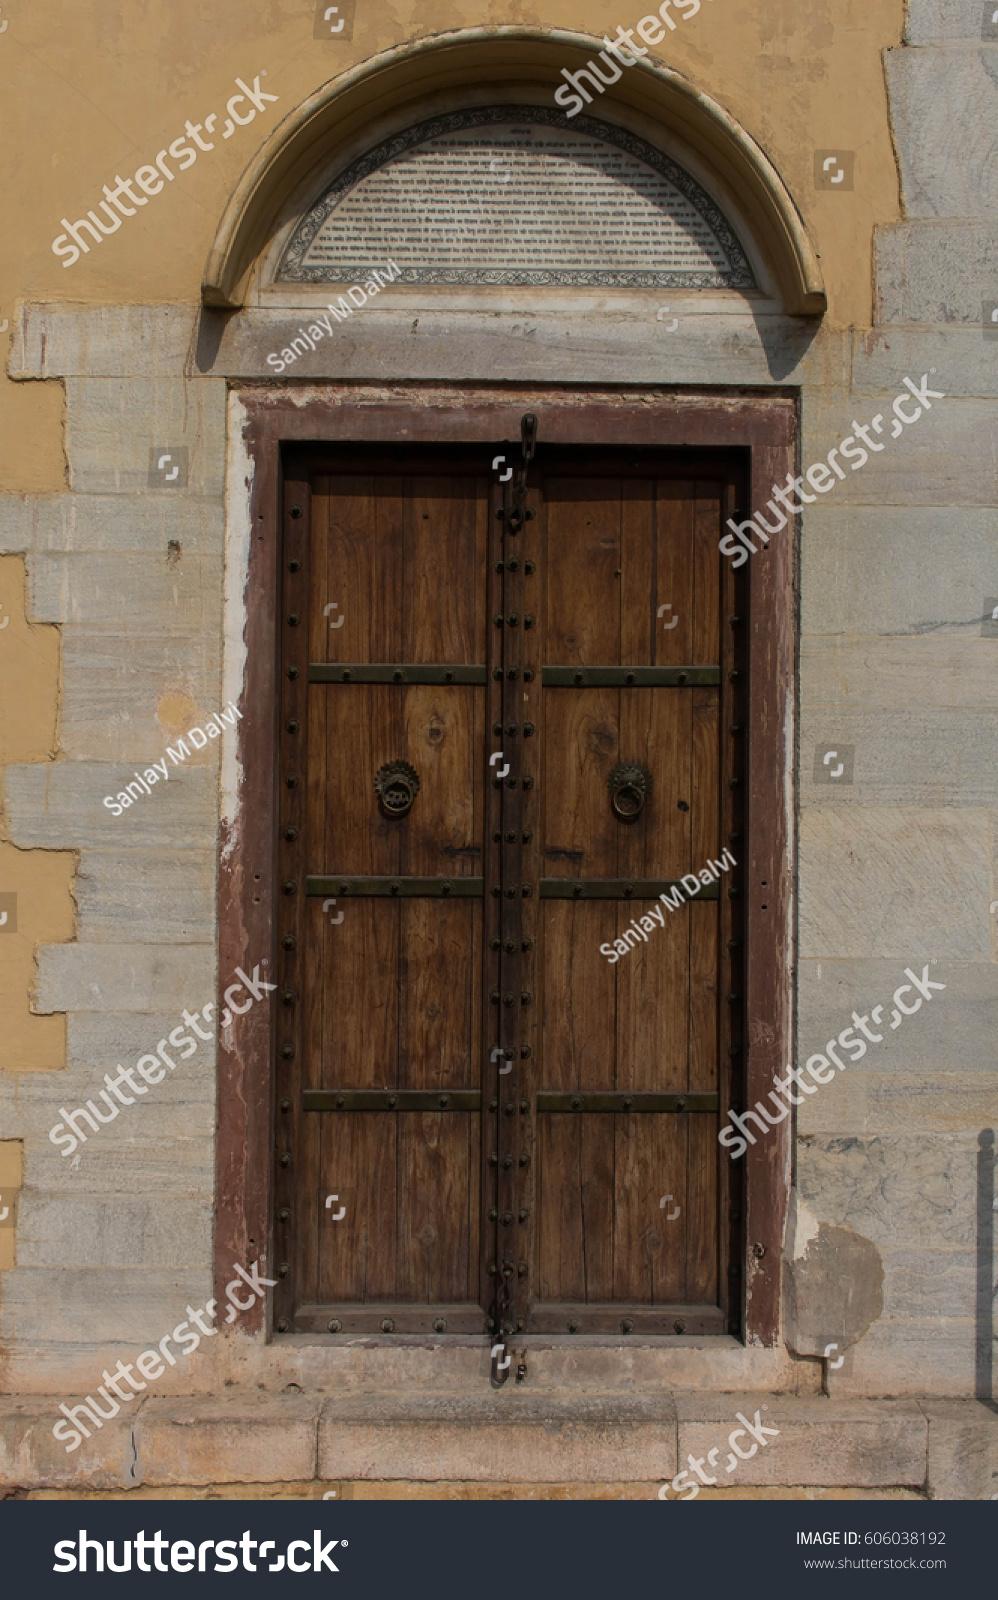 ID: 606038192 - Antique Wooden Door Frame From Jaipur City EZ Canvas